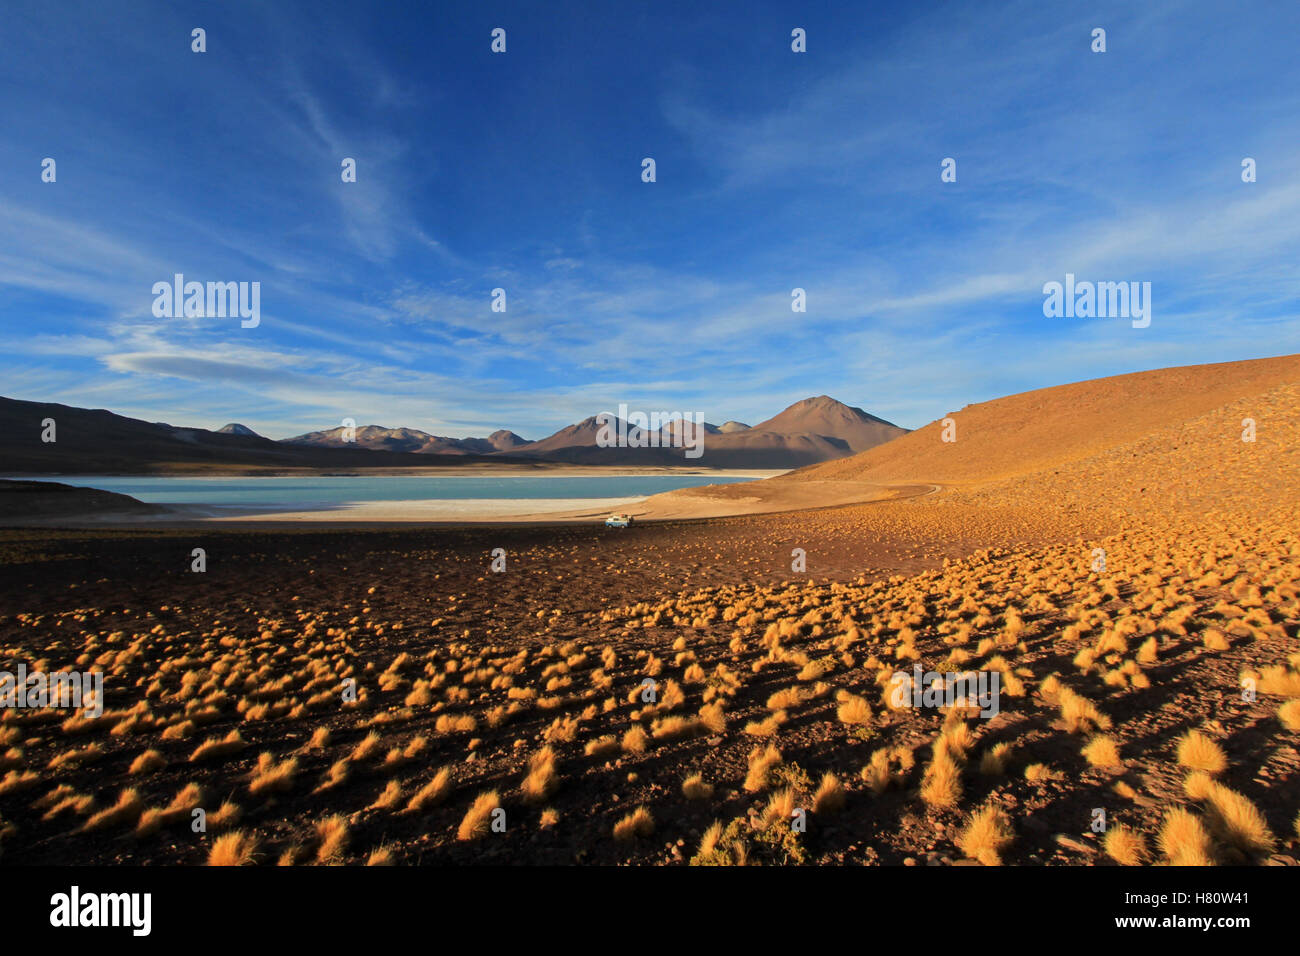 Laguna verde, green lagoon in Bolivia - Stock Image